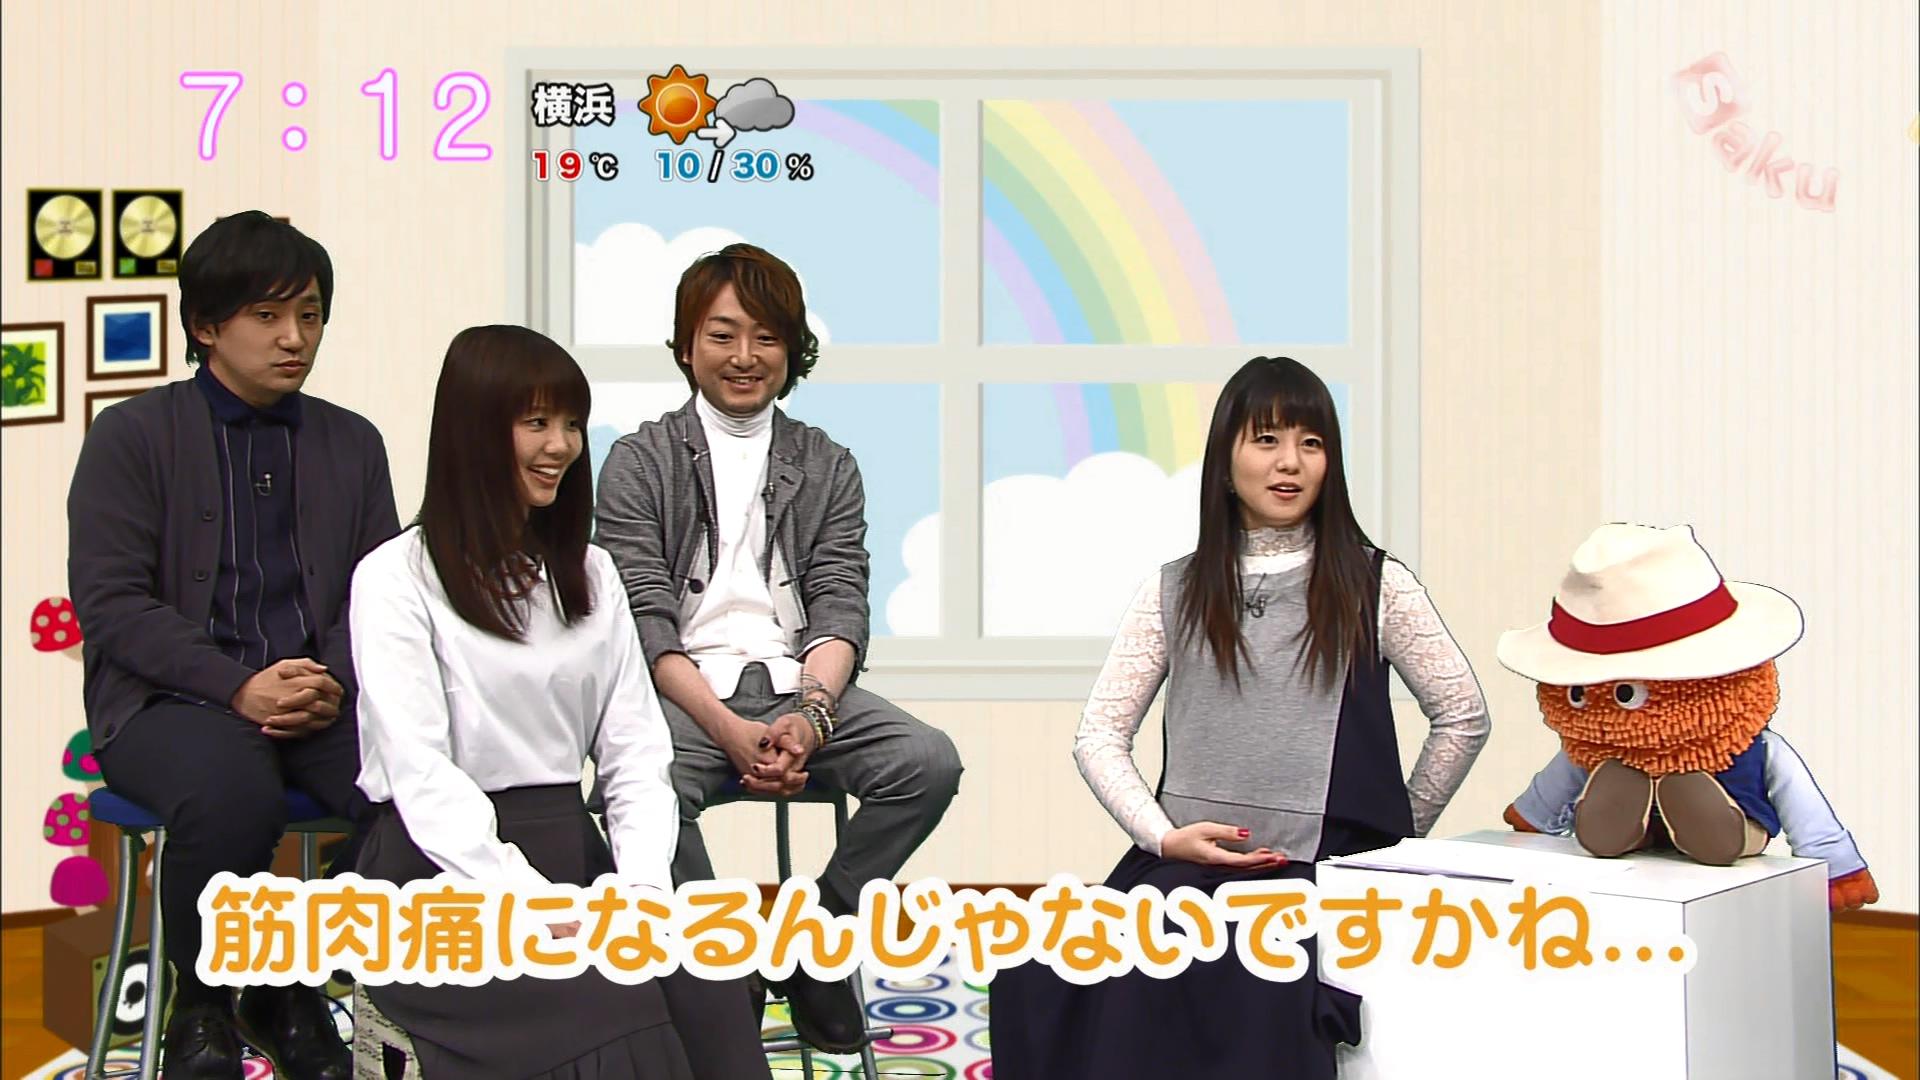 2016.03.18 いきものがかり(saku saku).ts_20160318_102615.033